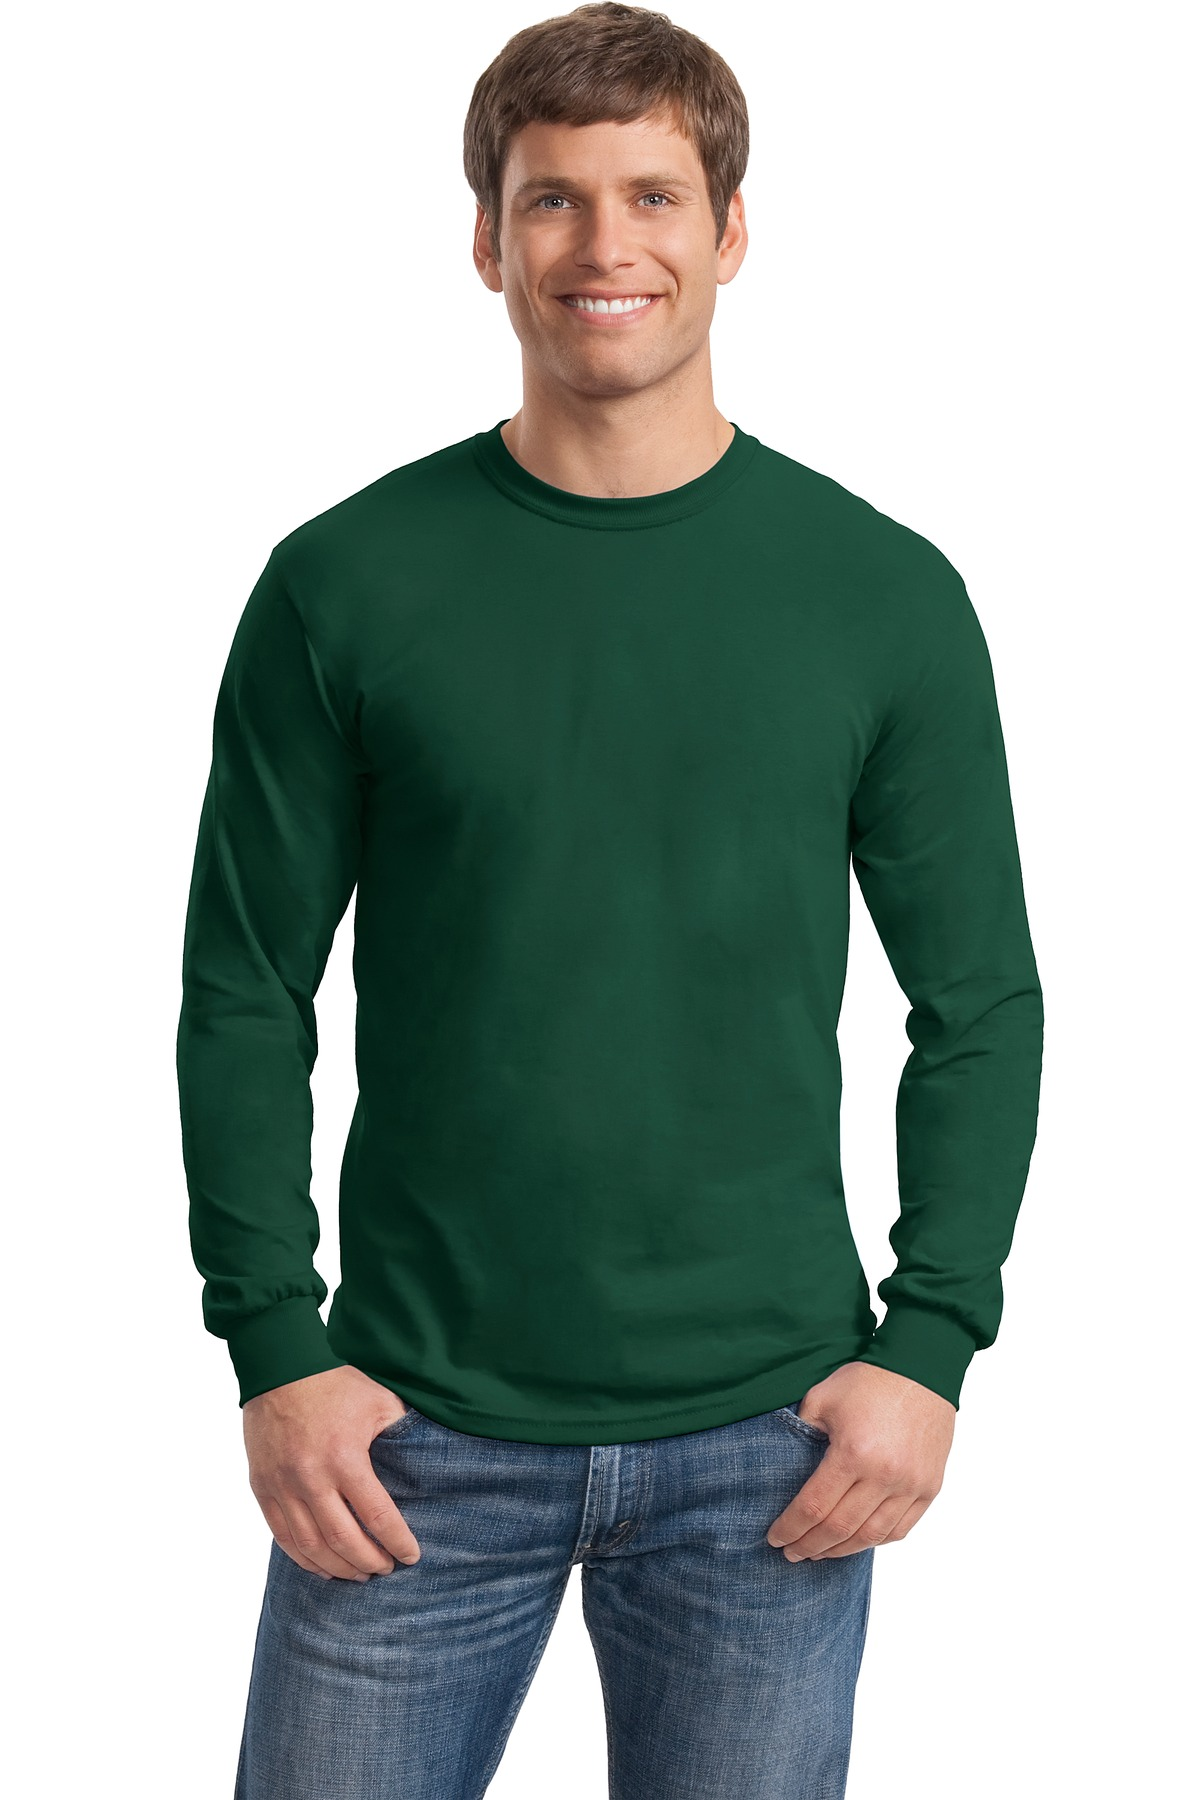 Gildan - DryBlend 50 Cotton, 50 DryBlend Poly Long Sleeve T-Shirt. 8400